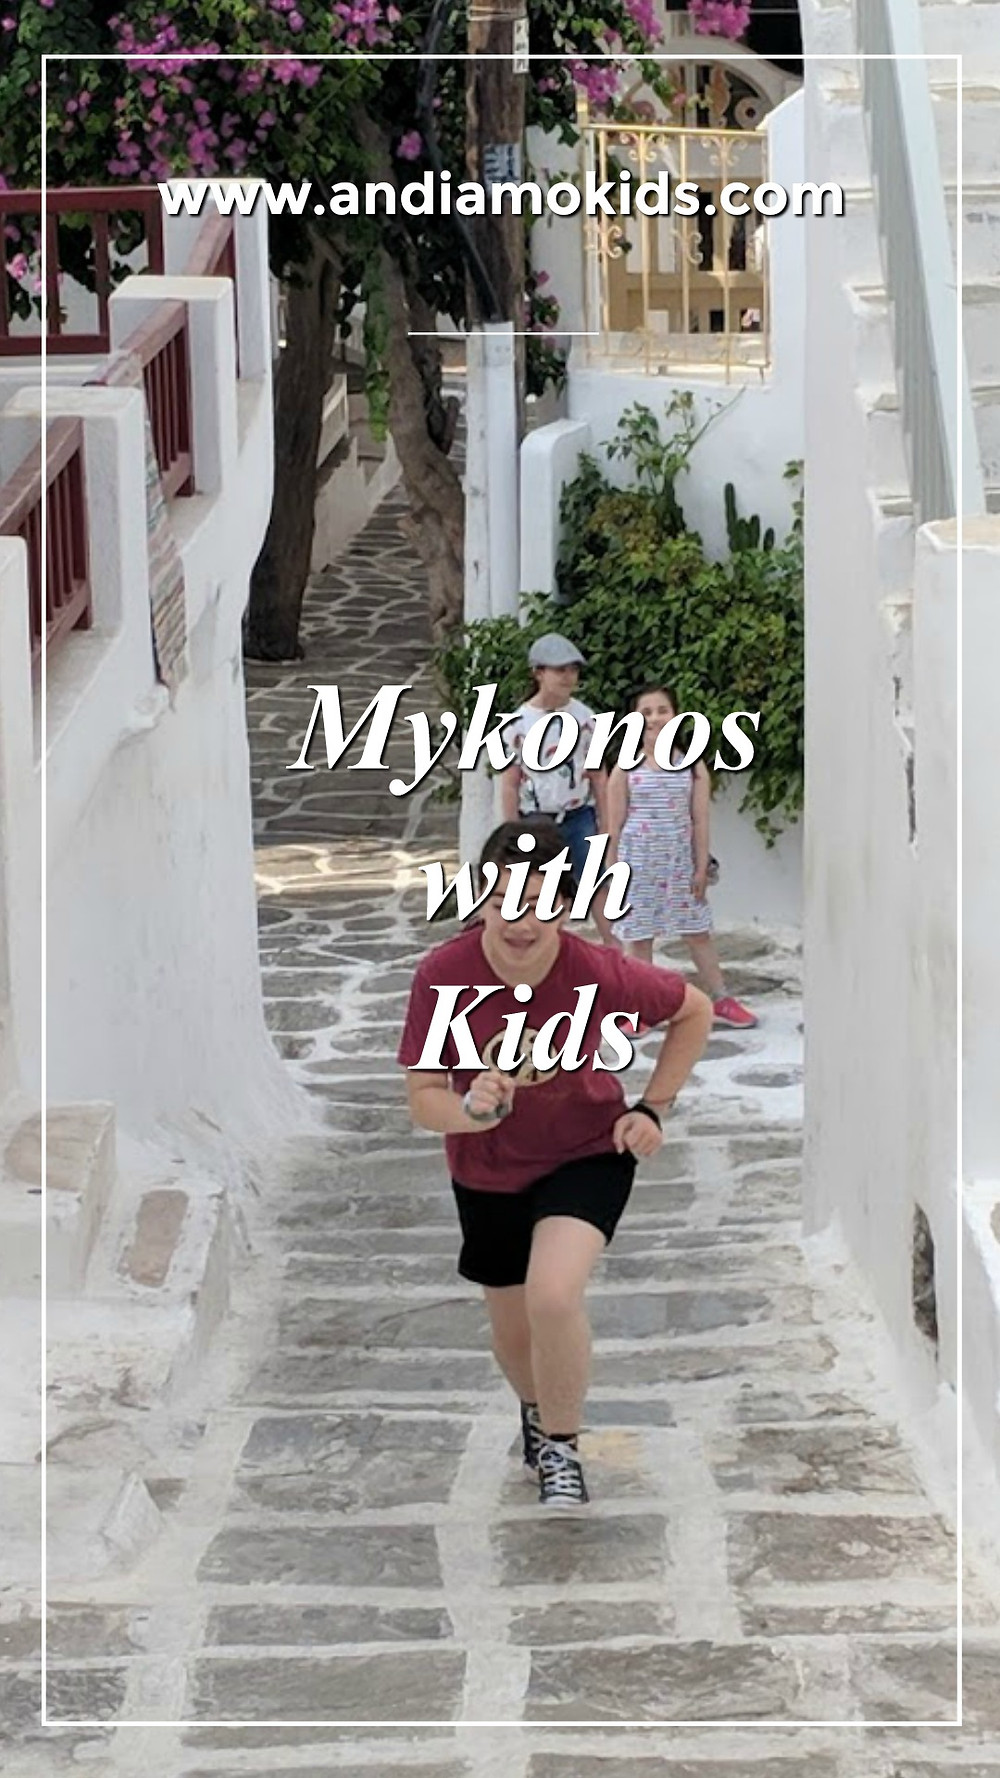 MykonoswithKids